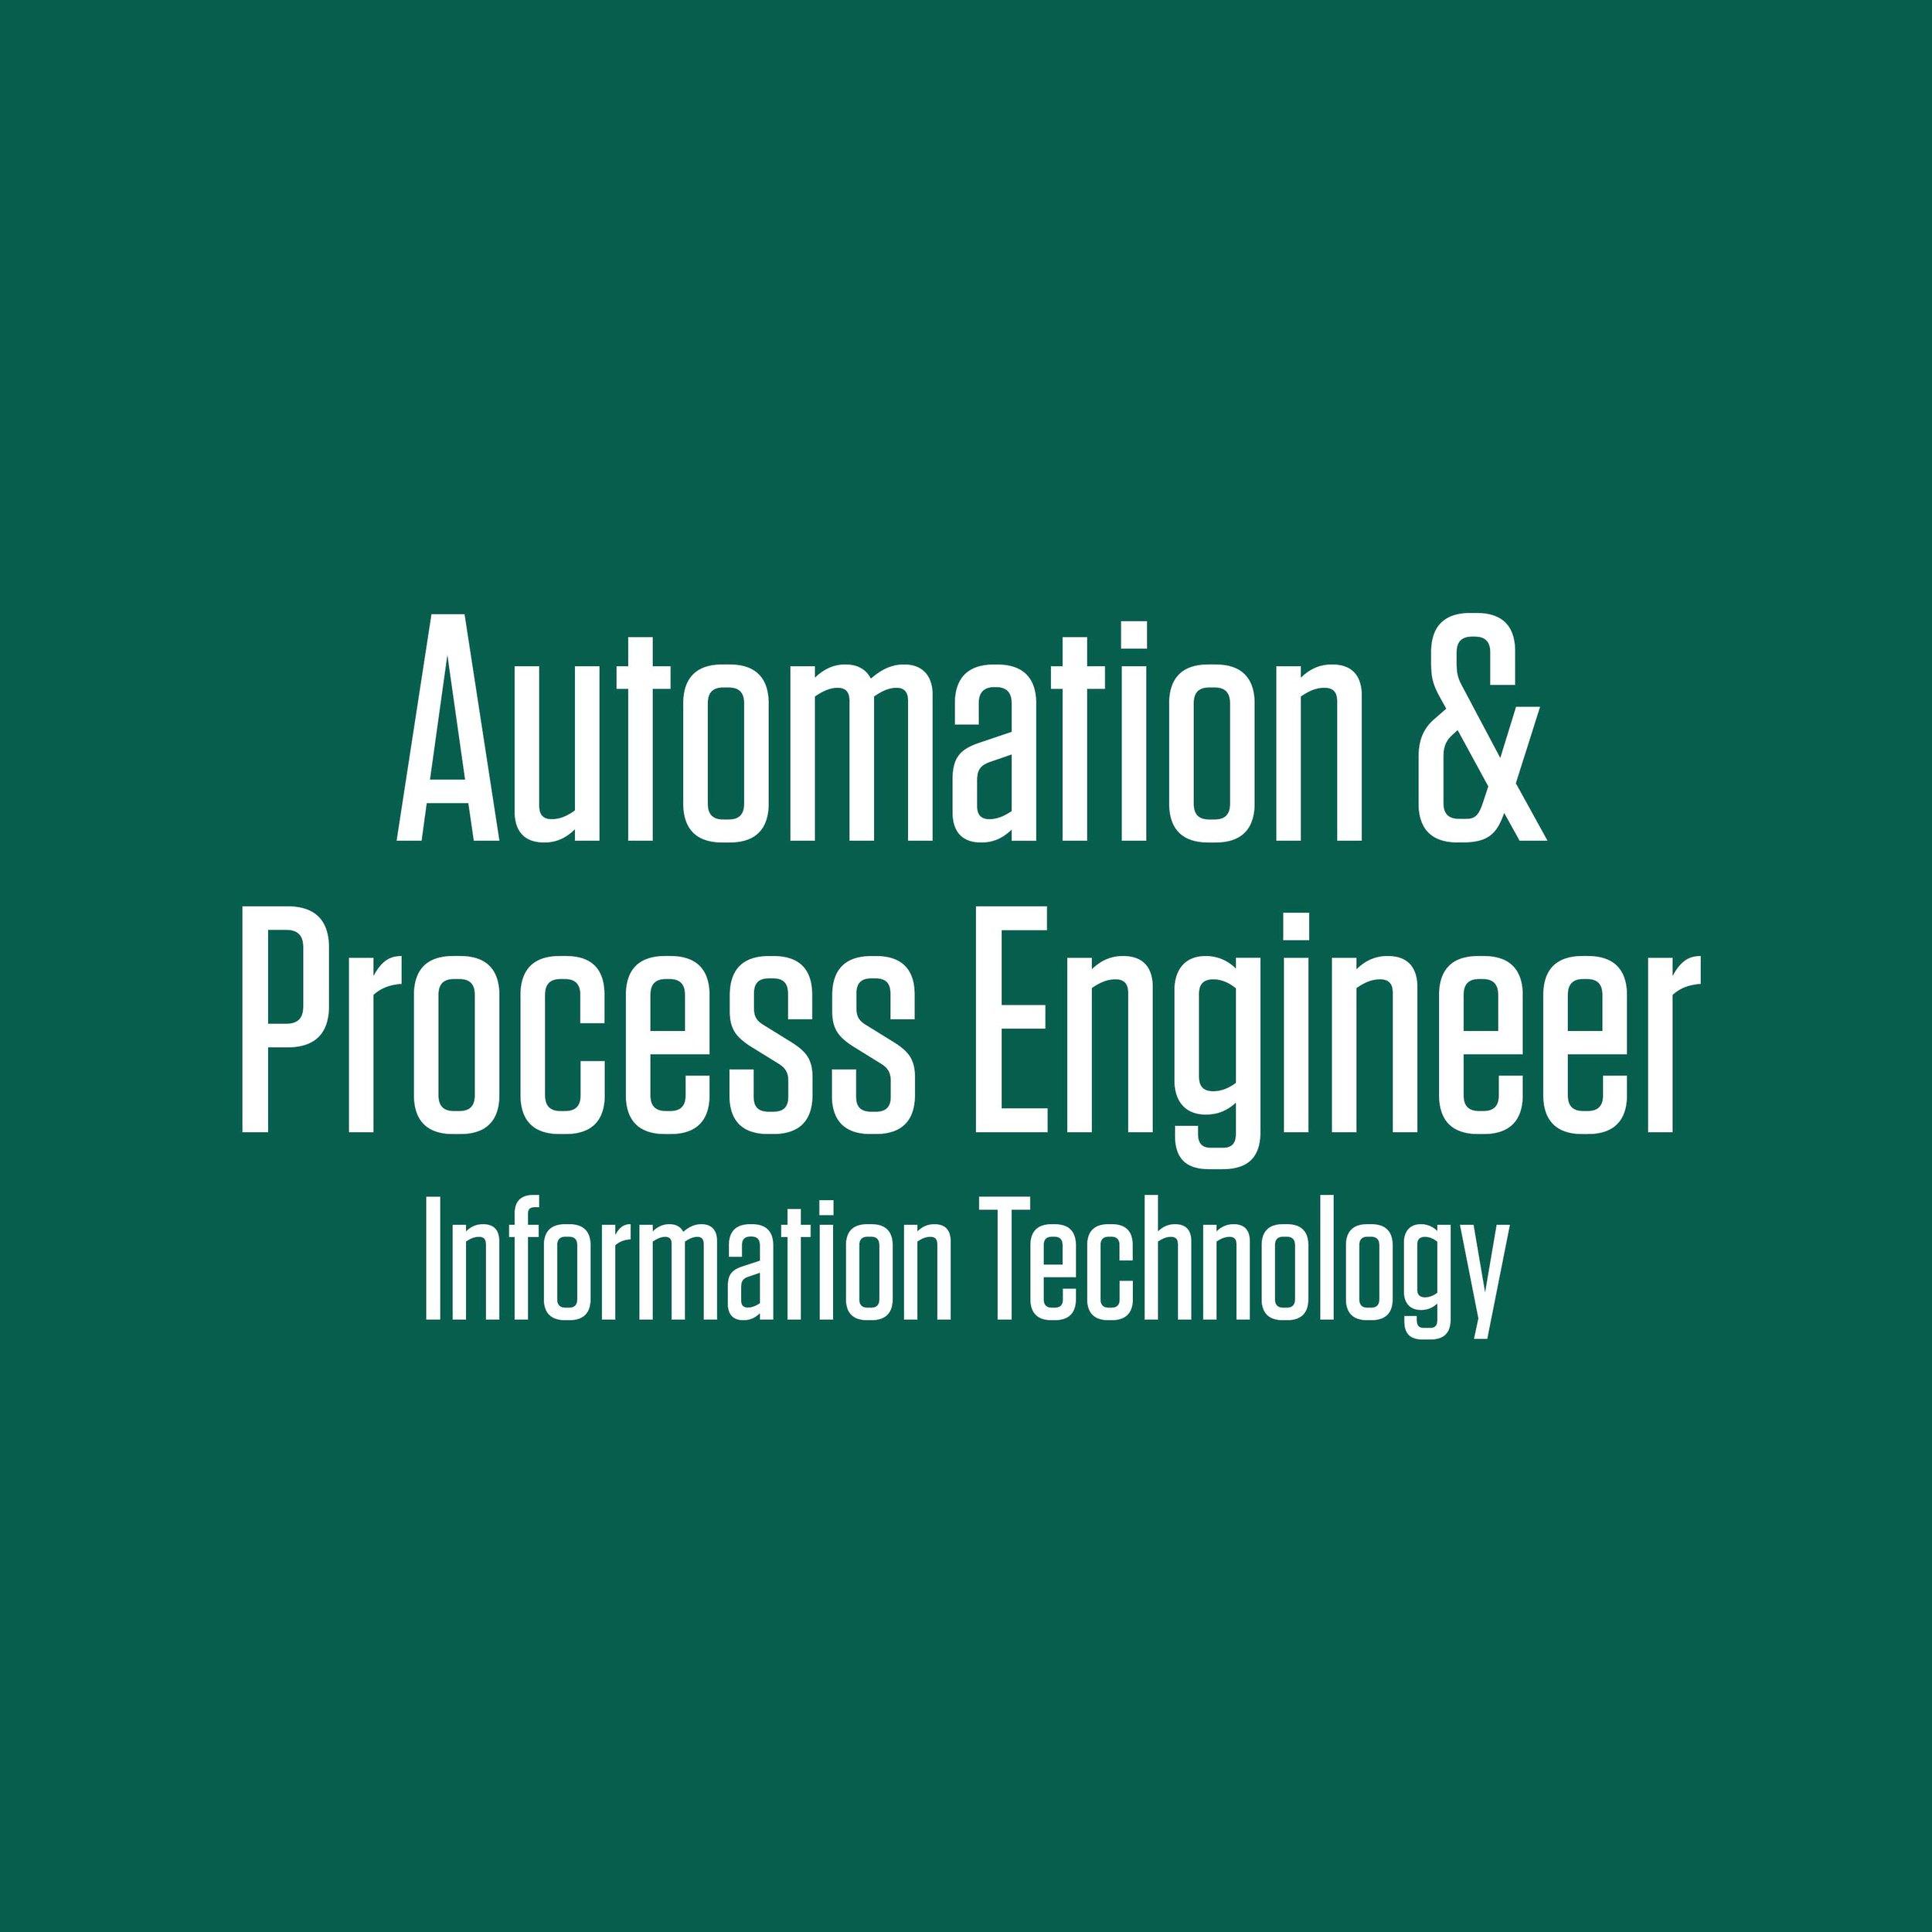 automation engineer.jpg